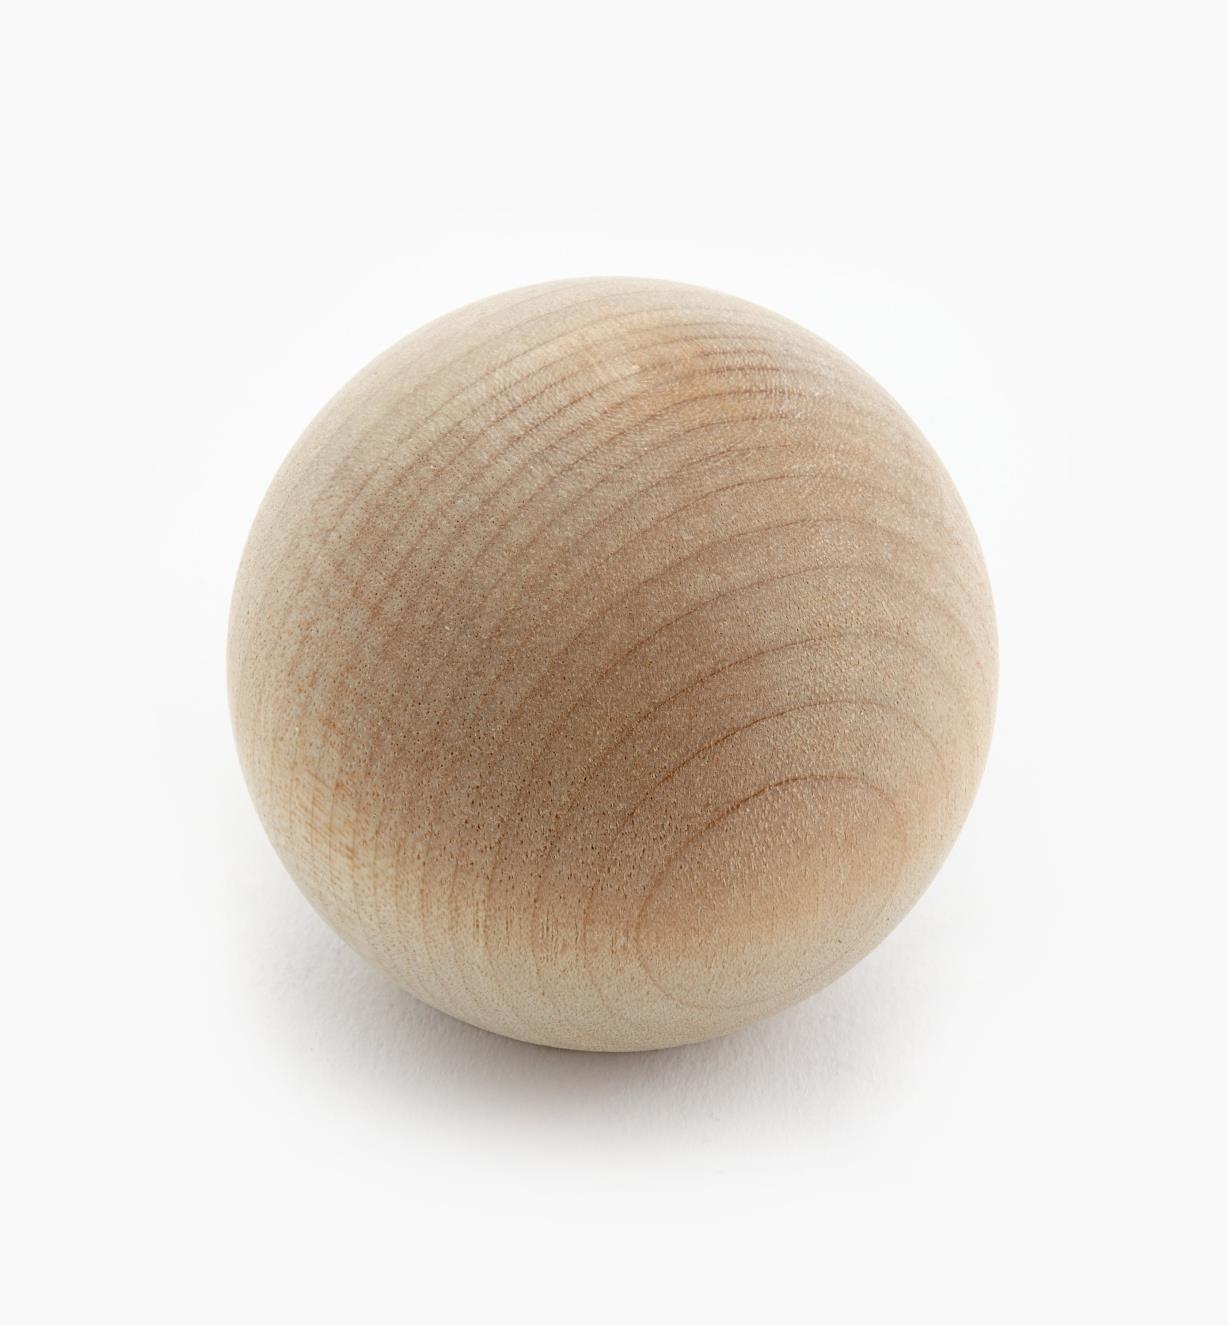 "41K2604 - 1 1/2"" dia. Ball"